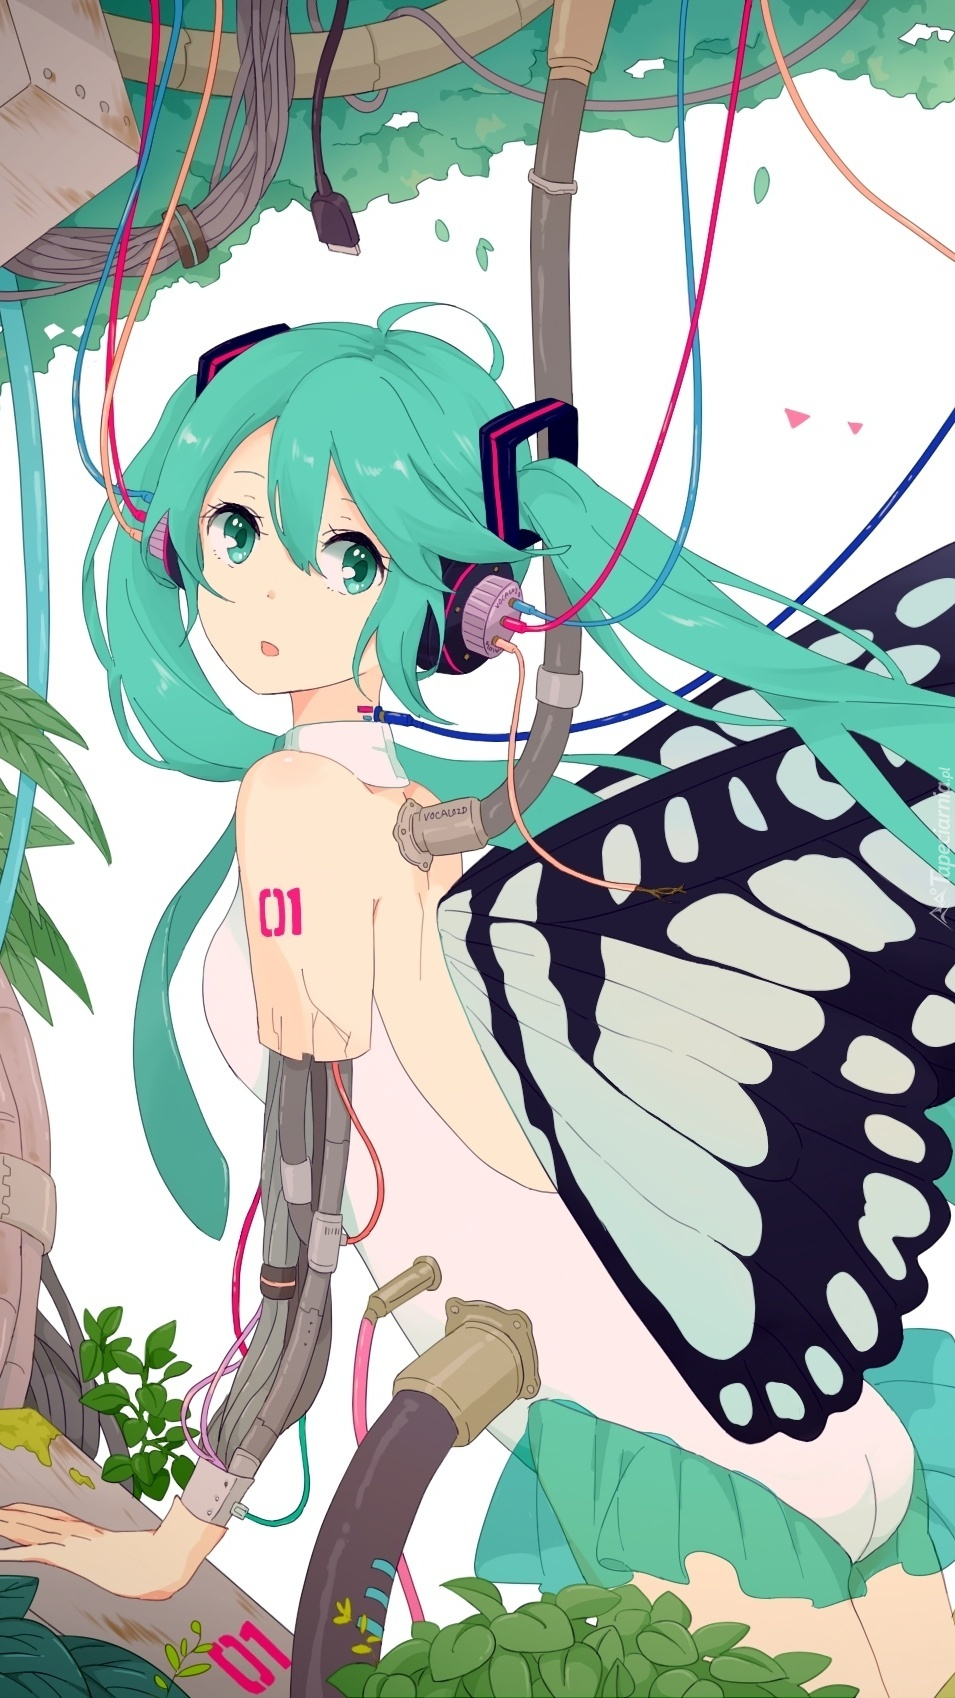 Hatsune Miku słucha muzyki